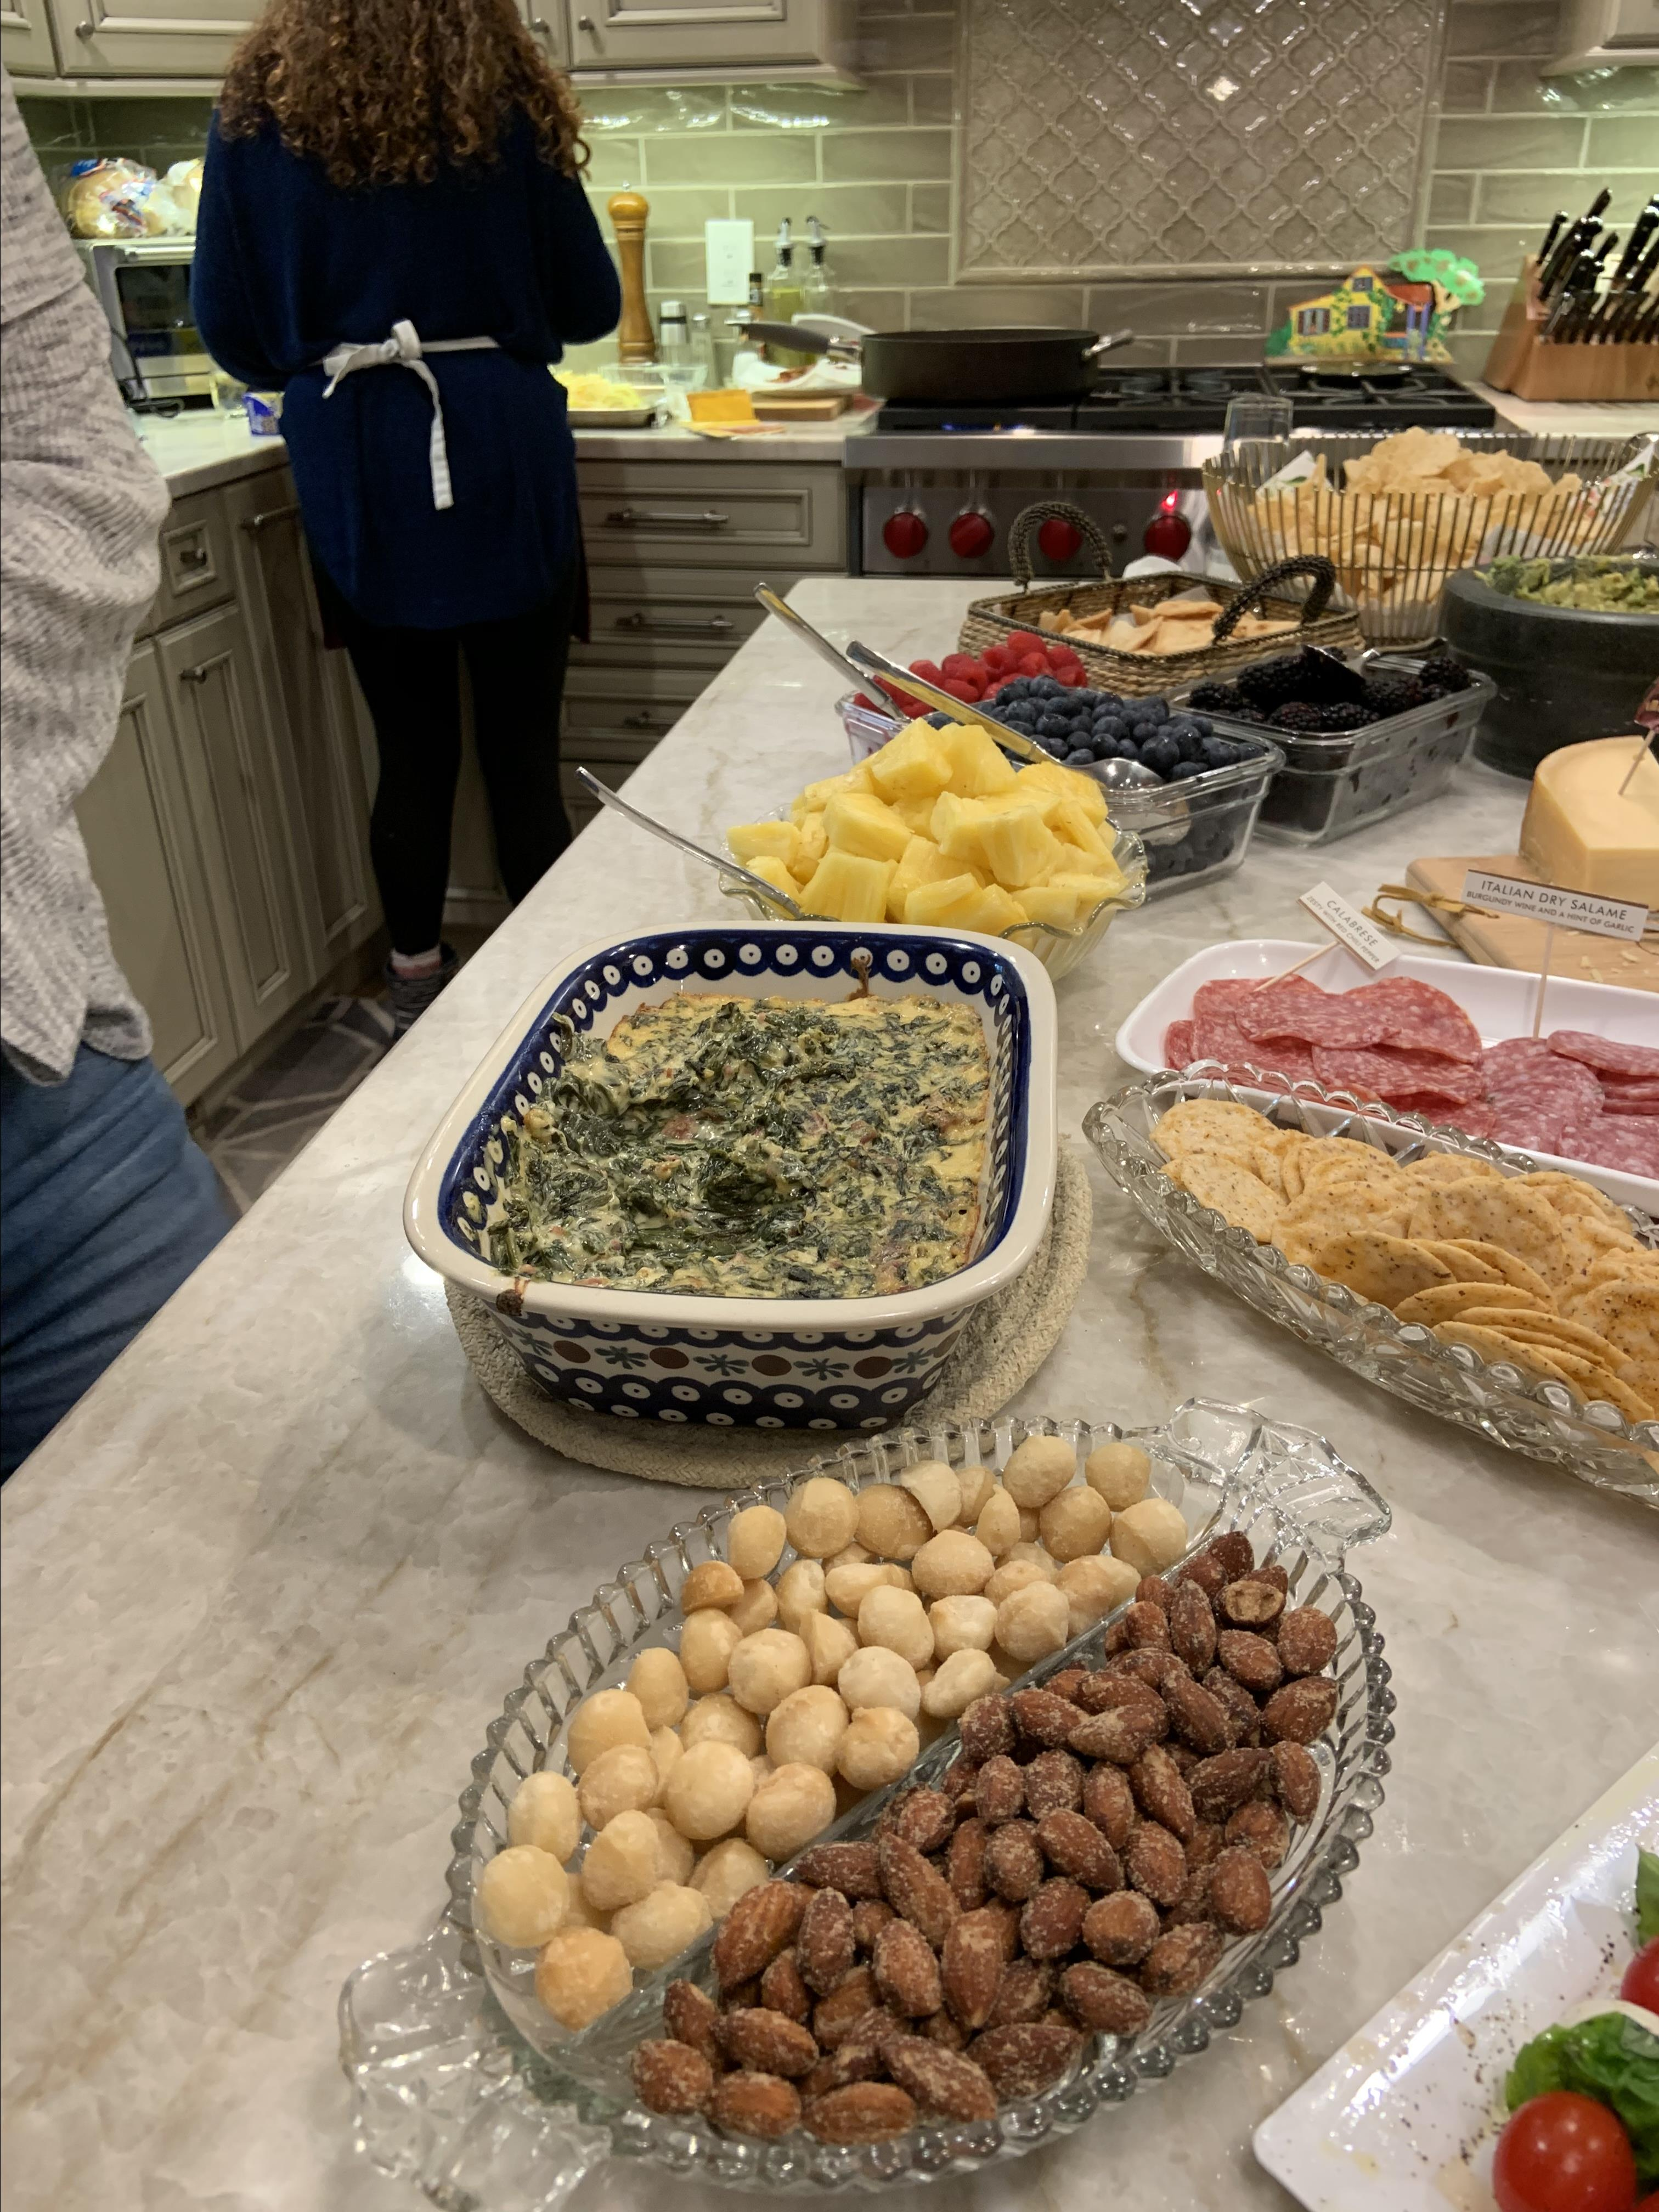 Spinach Kale Bacon Dip Benito Costatini